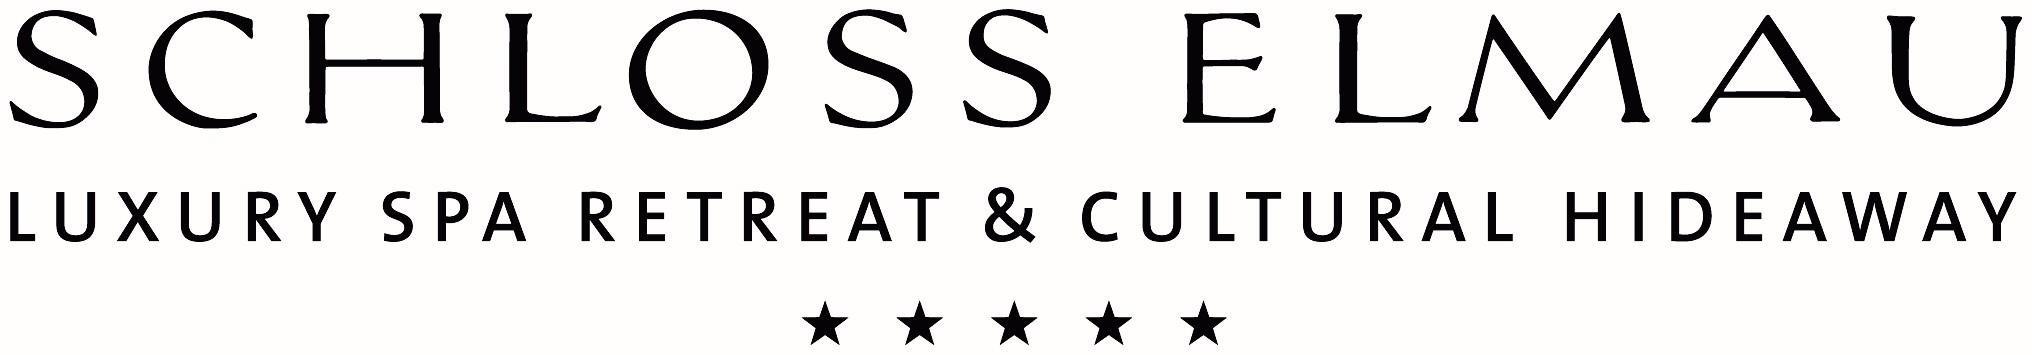 schloss elmlau logo